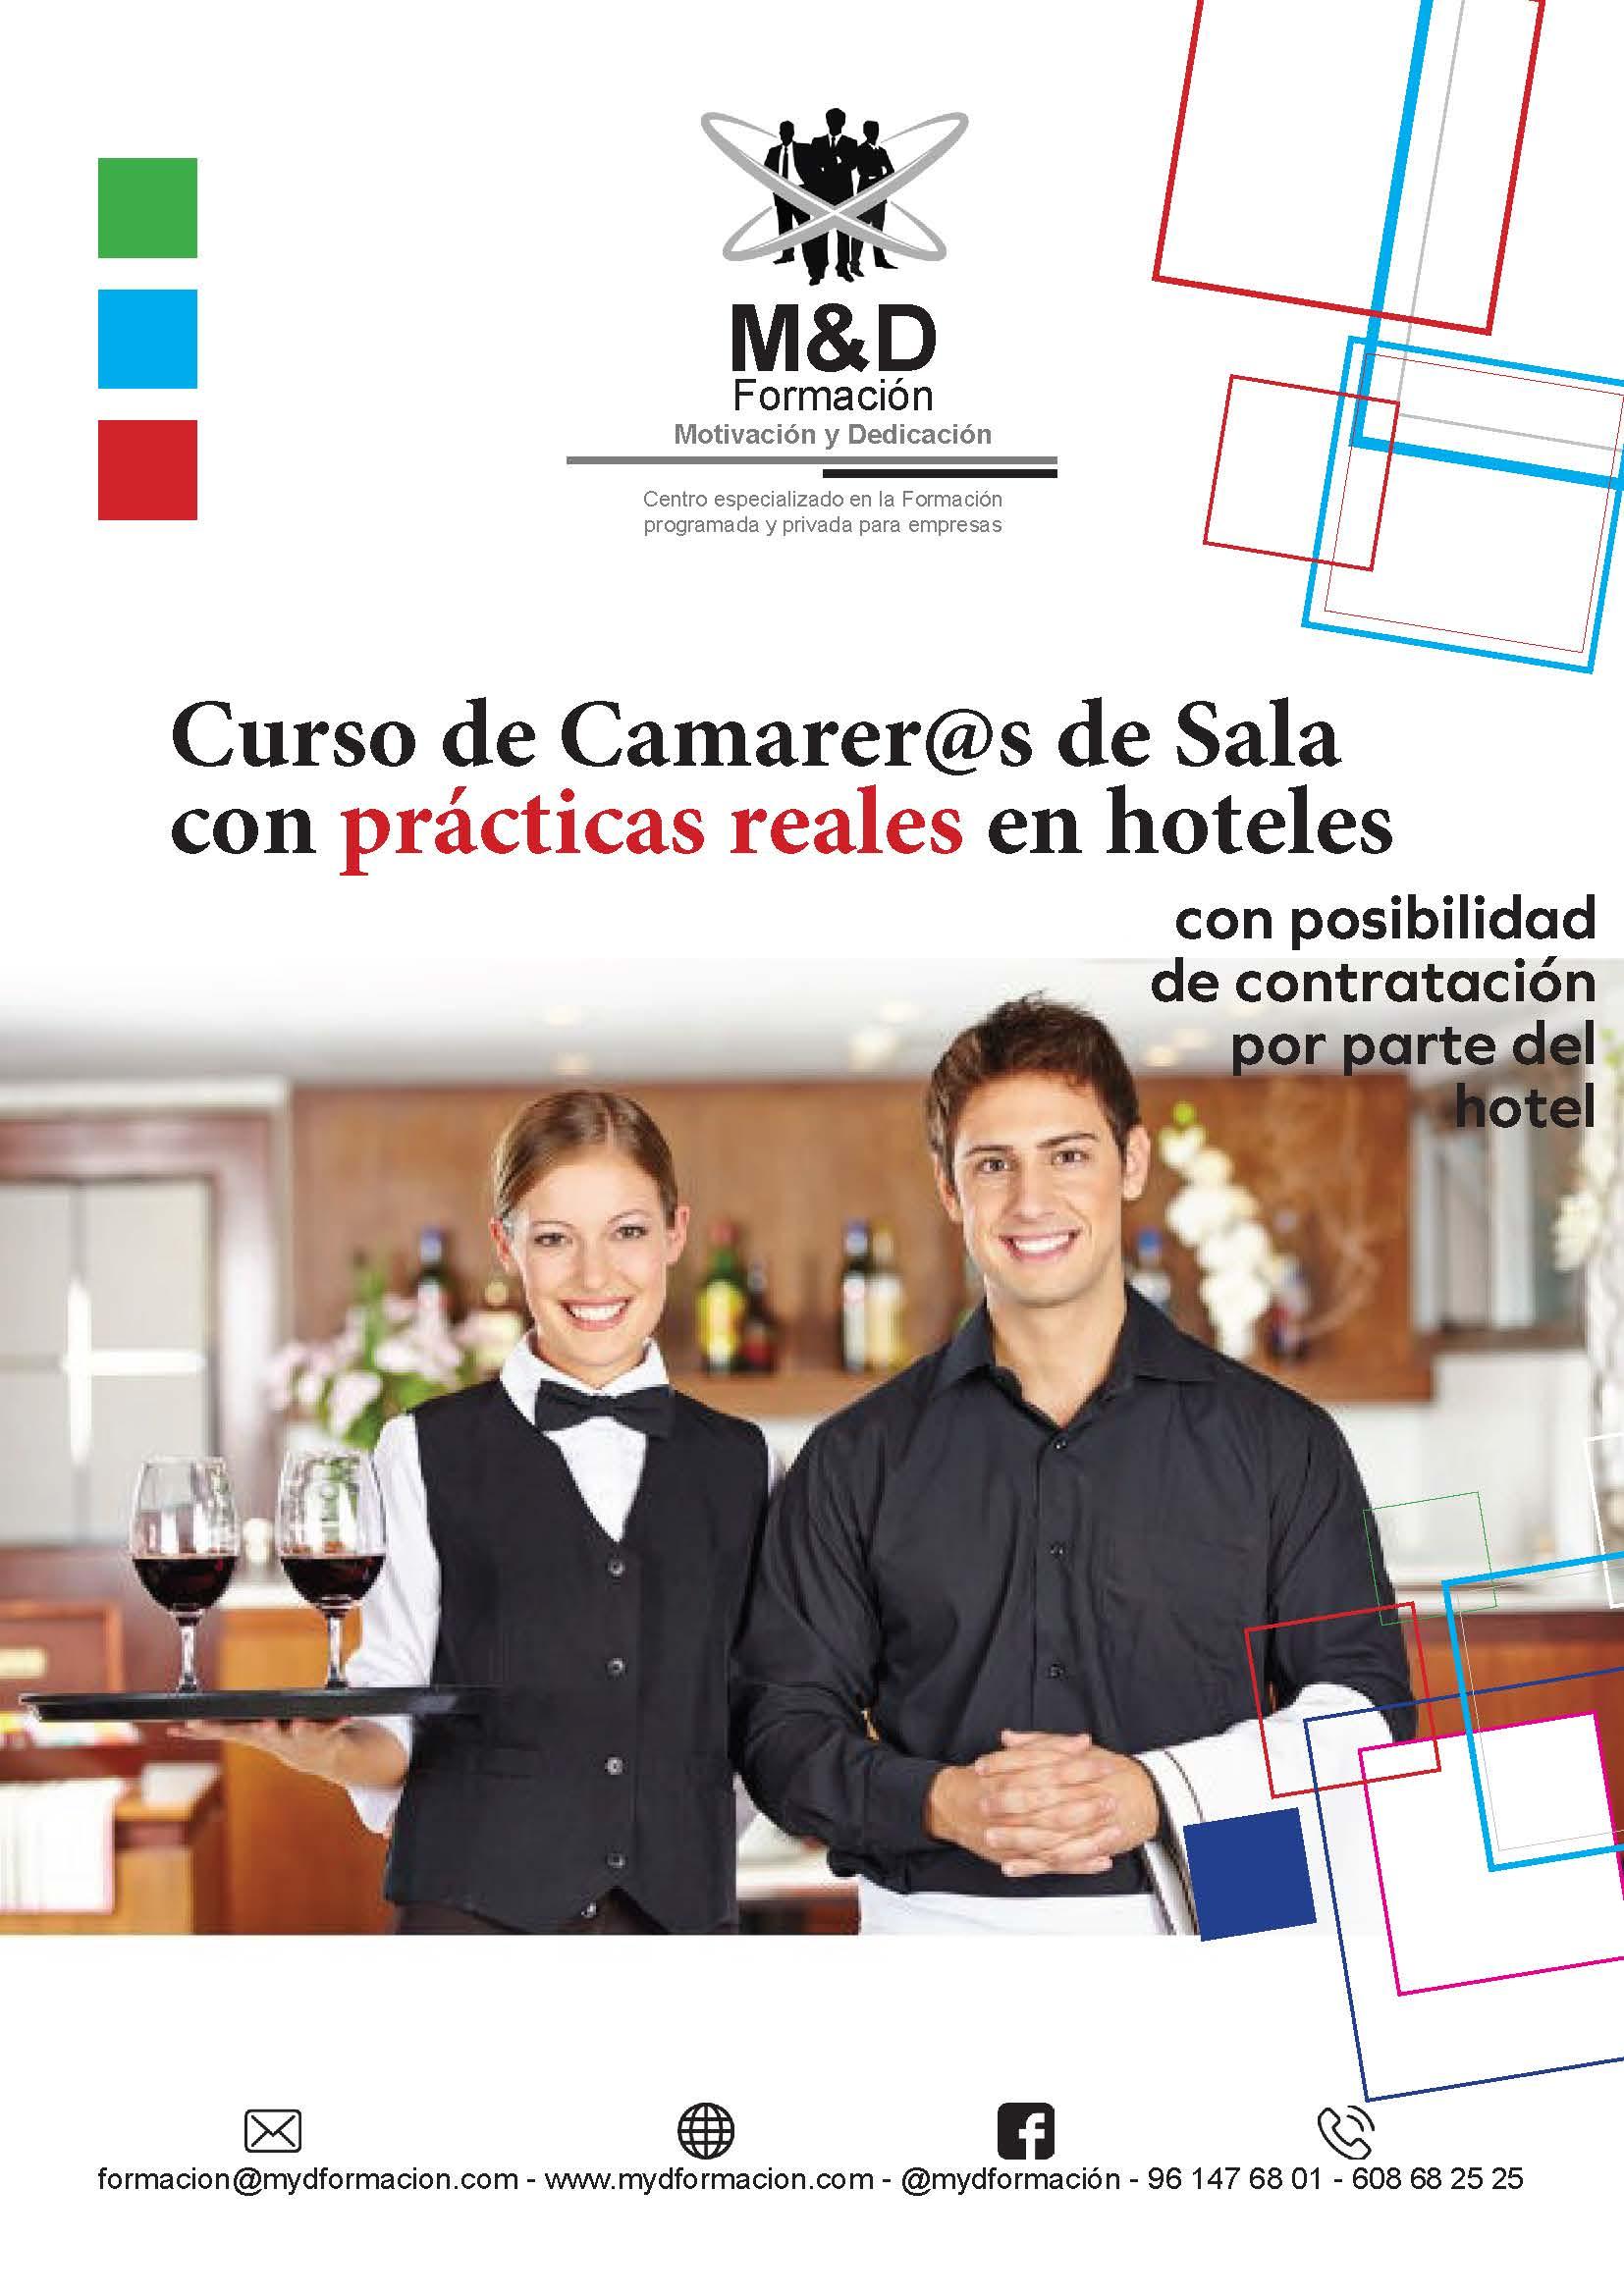 CARTEL DE CAMAREROS DE SALA - Ofertas